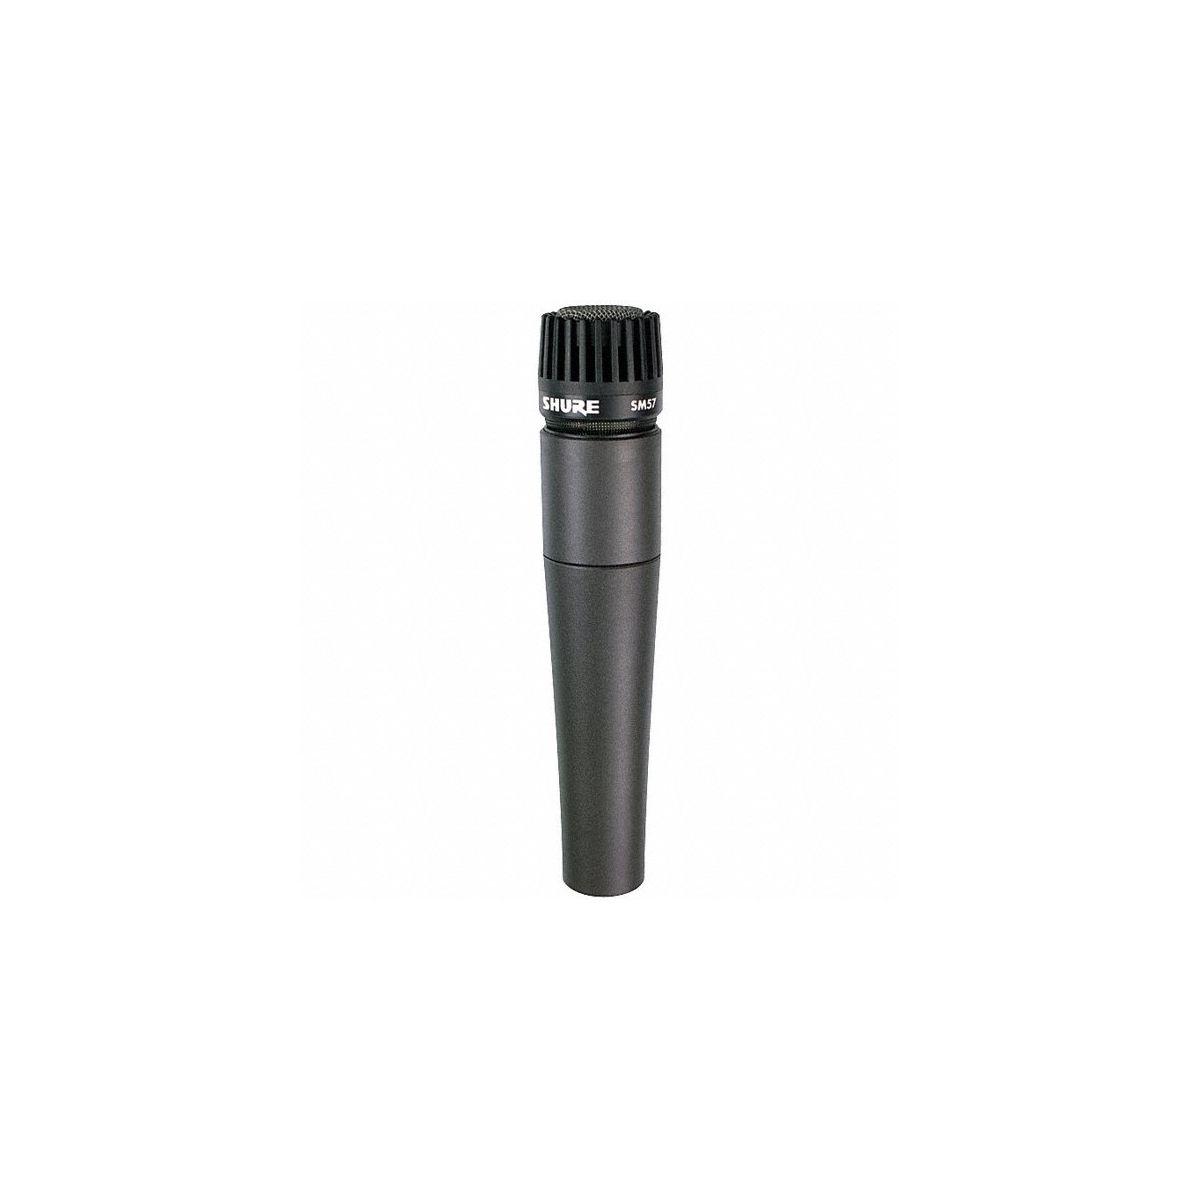 Micros chant - Shure - SM57